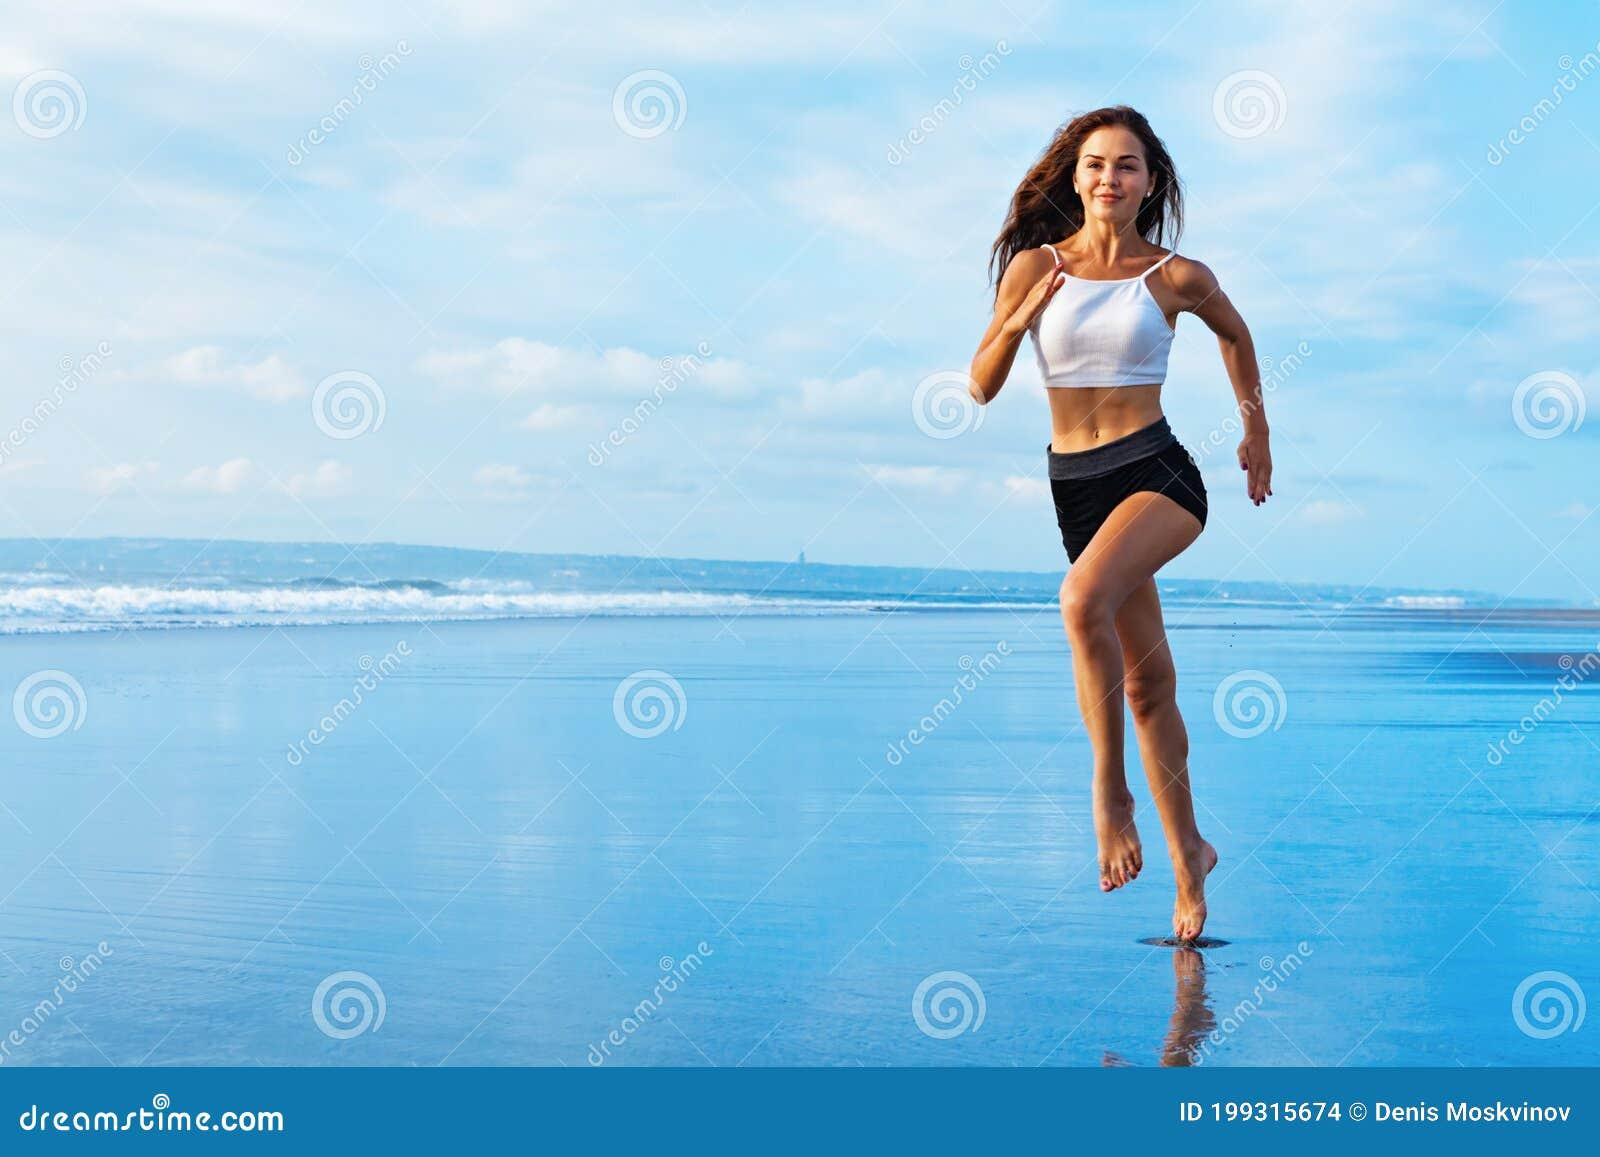 Teens on nude beach